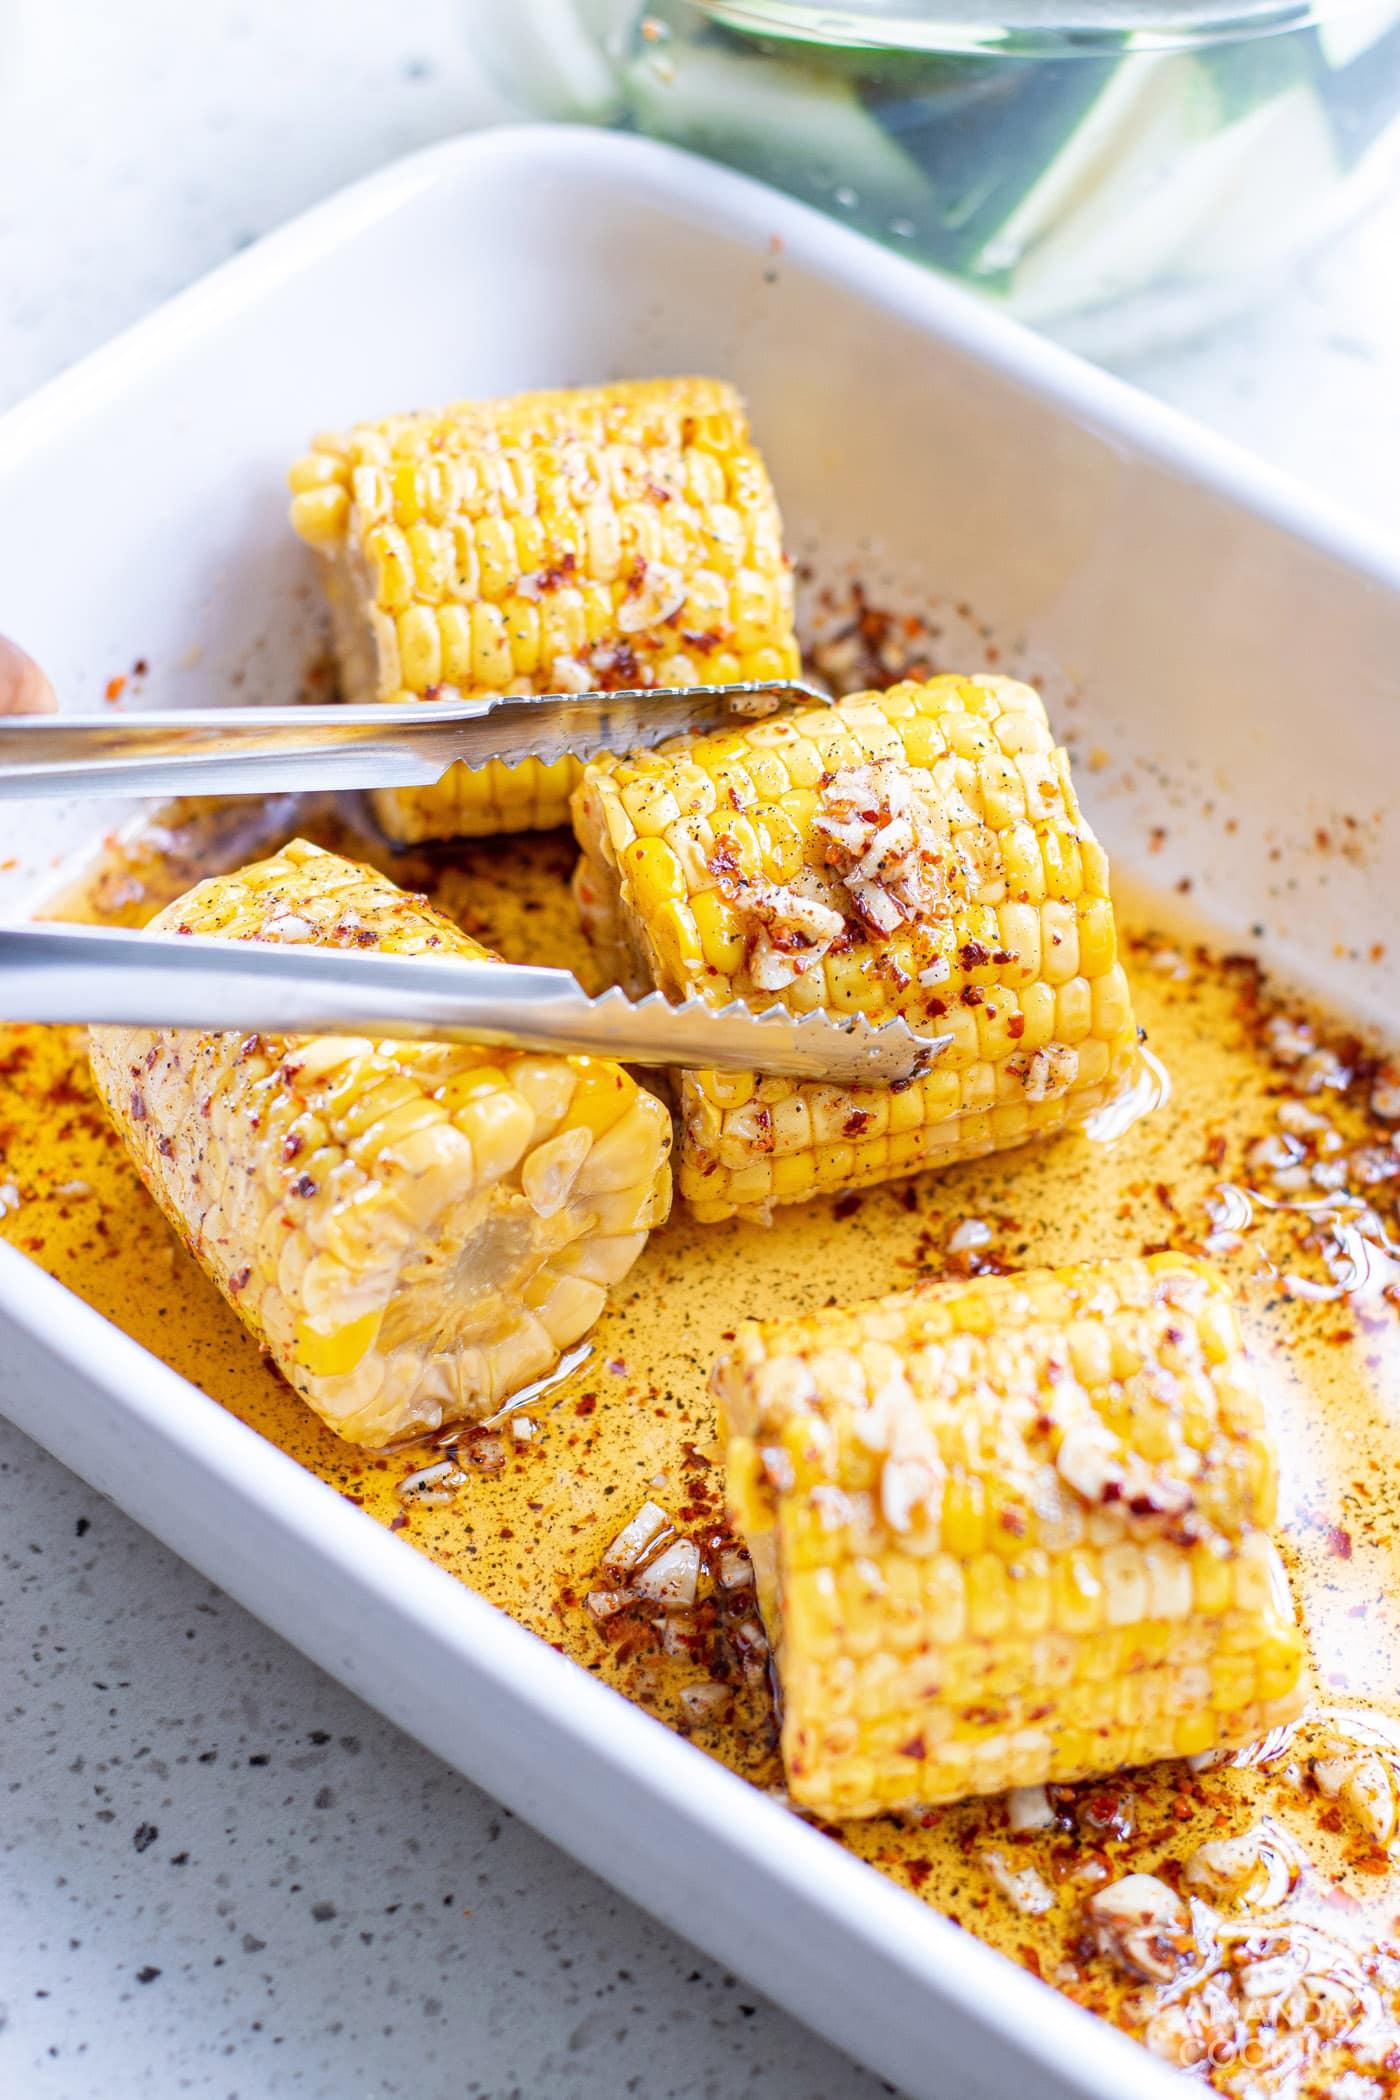 tongs holding marinated corn on the cob